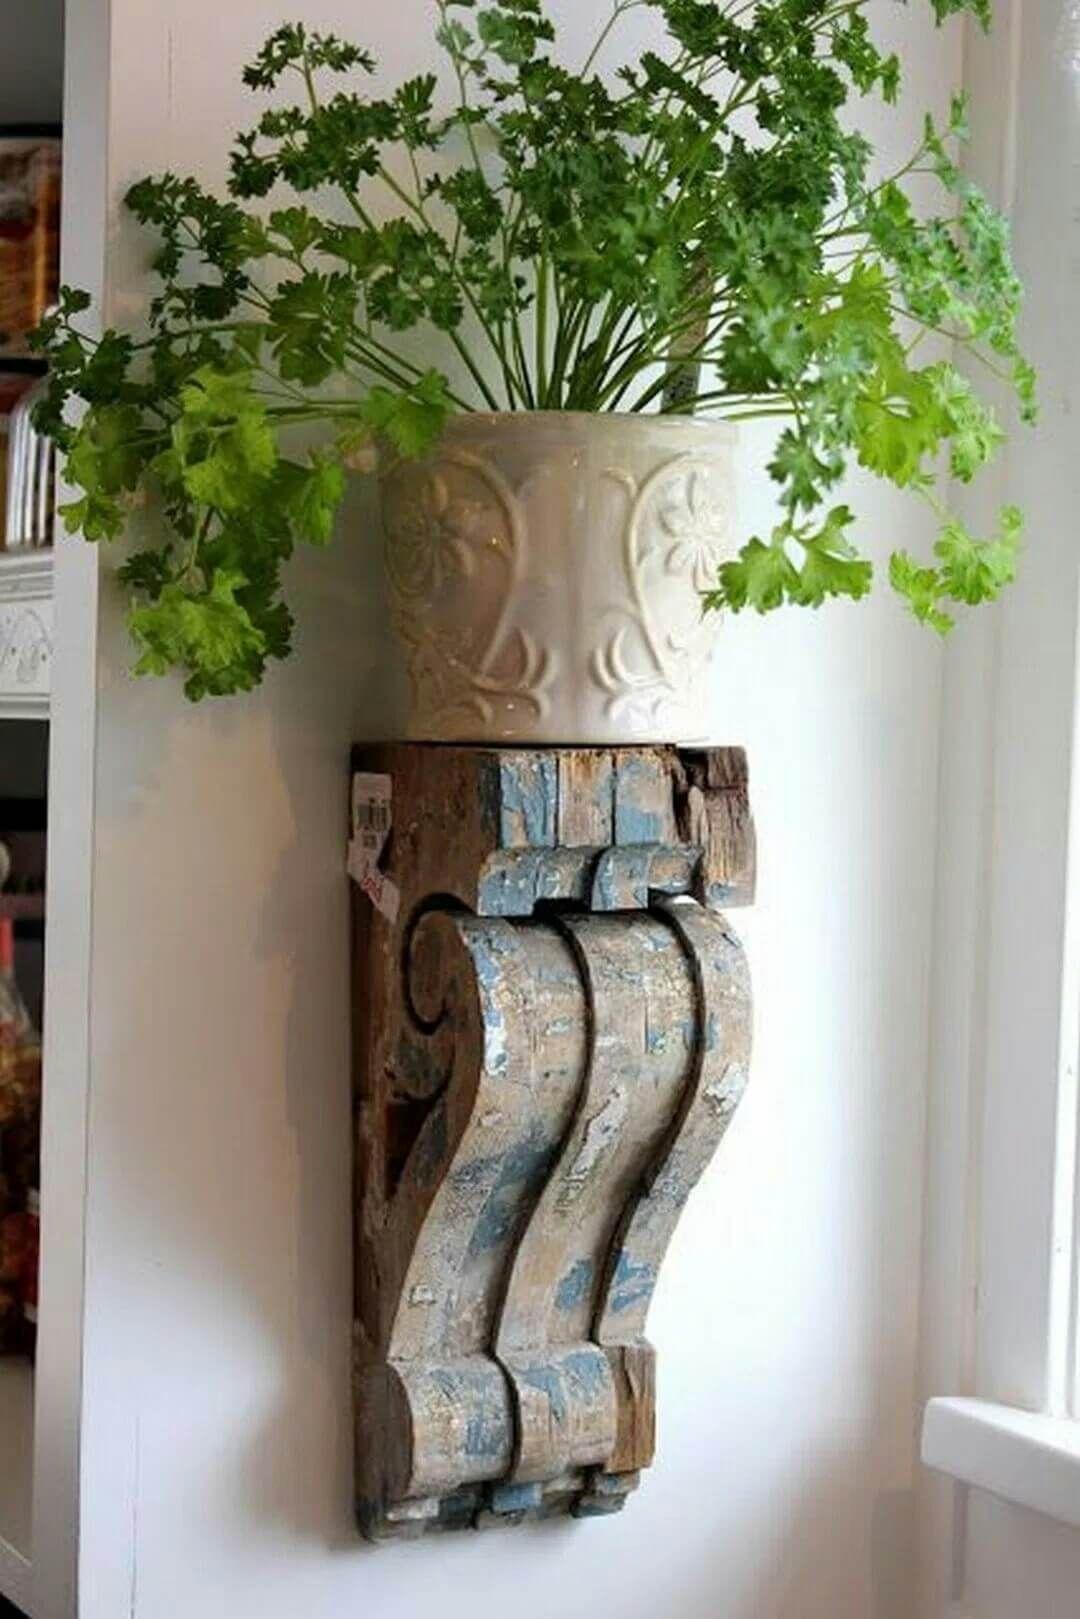 Idee Creative Per La Casa 37 creative ideas for decorating with rustic corbels | idee